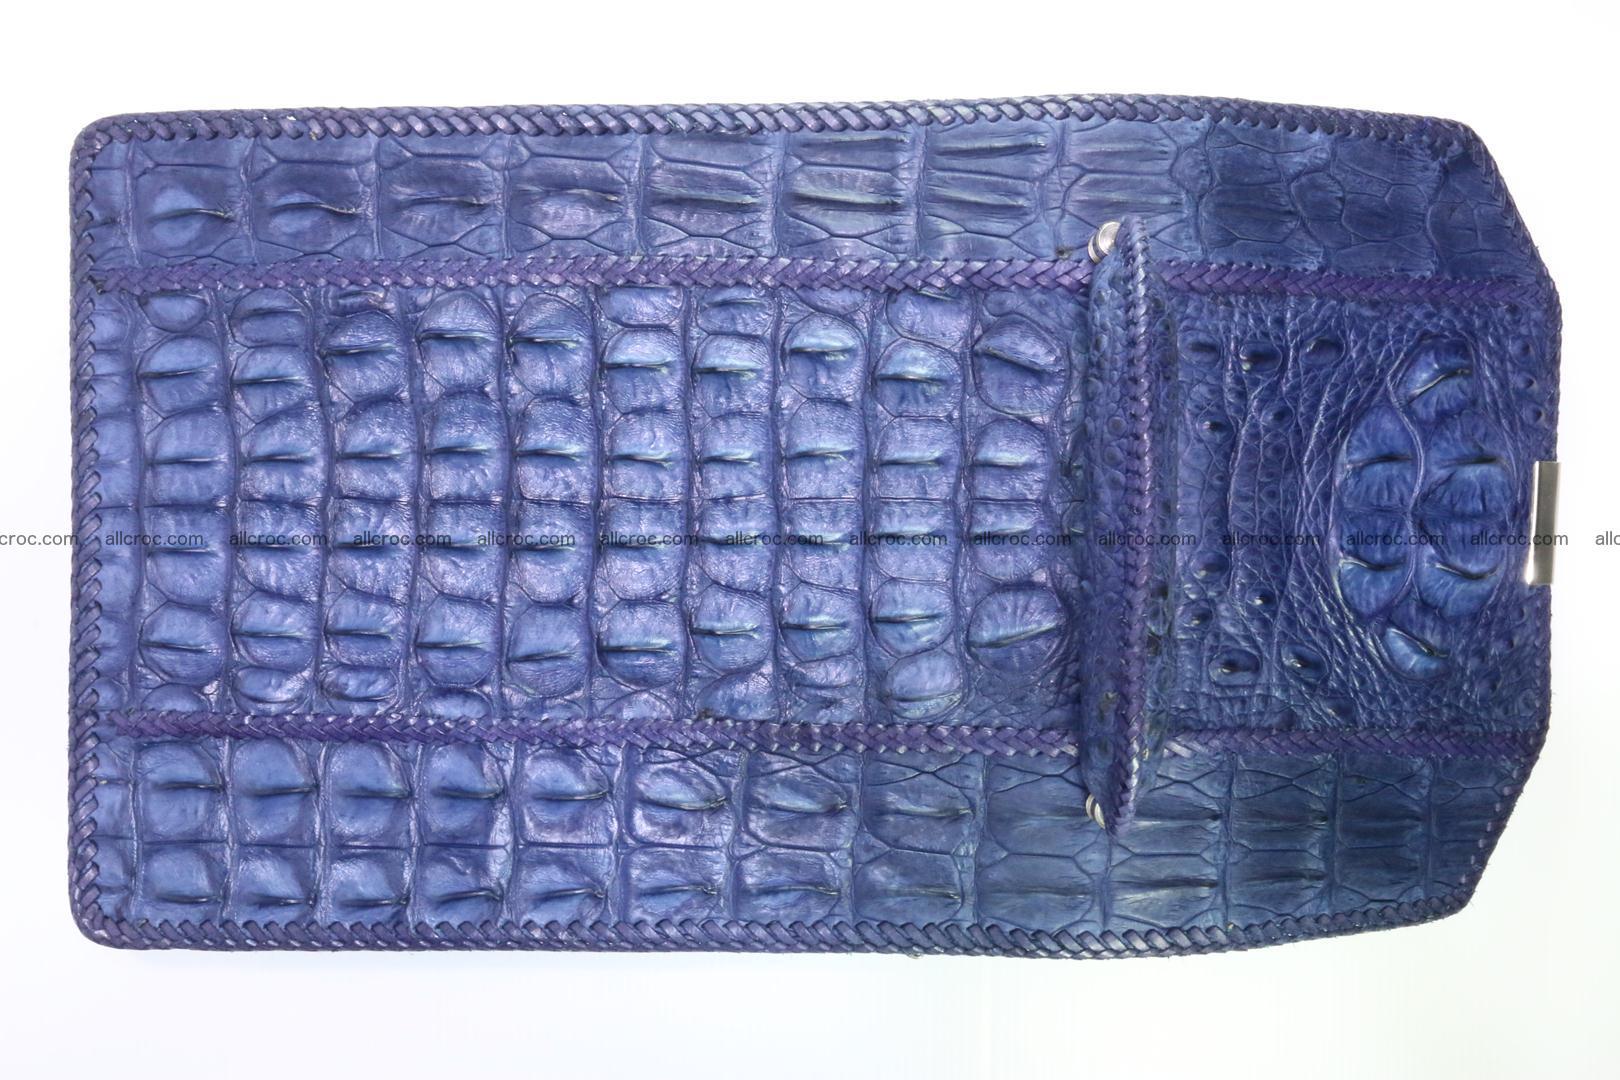 Crocodile skin messenger bag braided edges 419 Foto 10